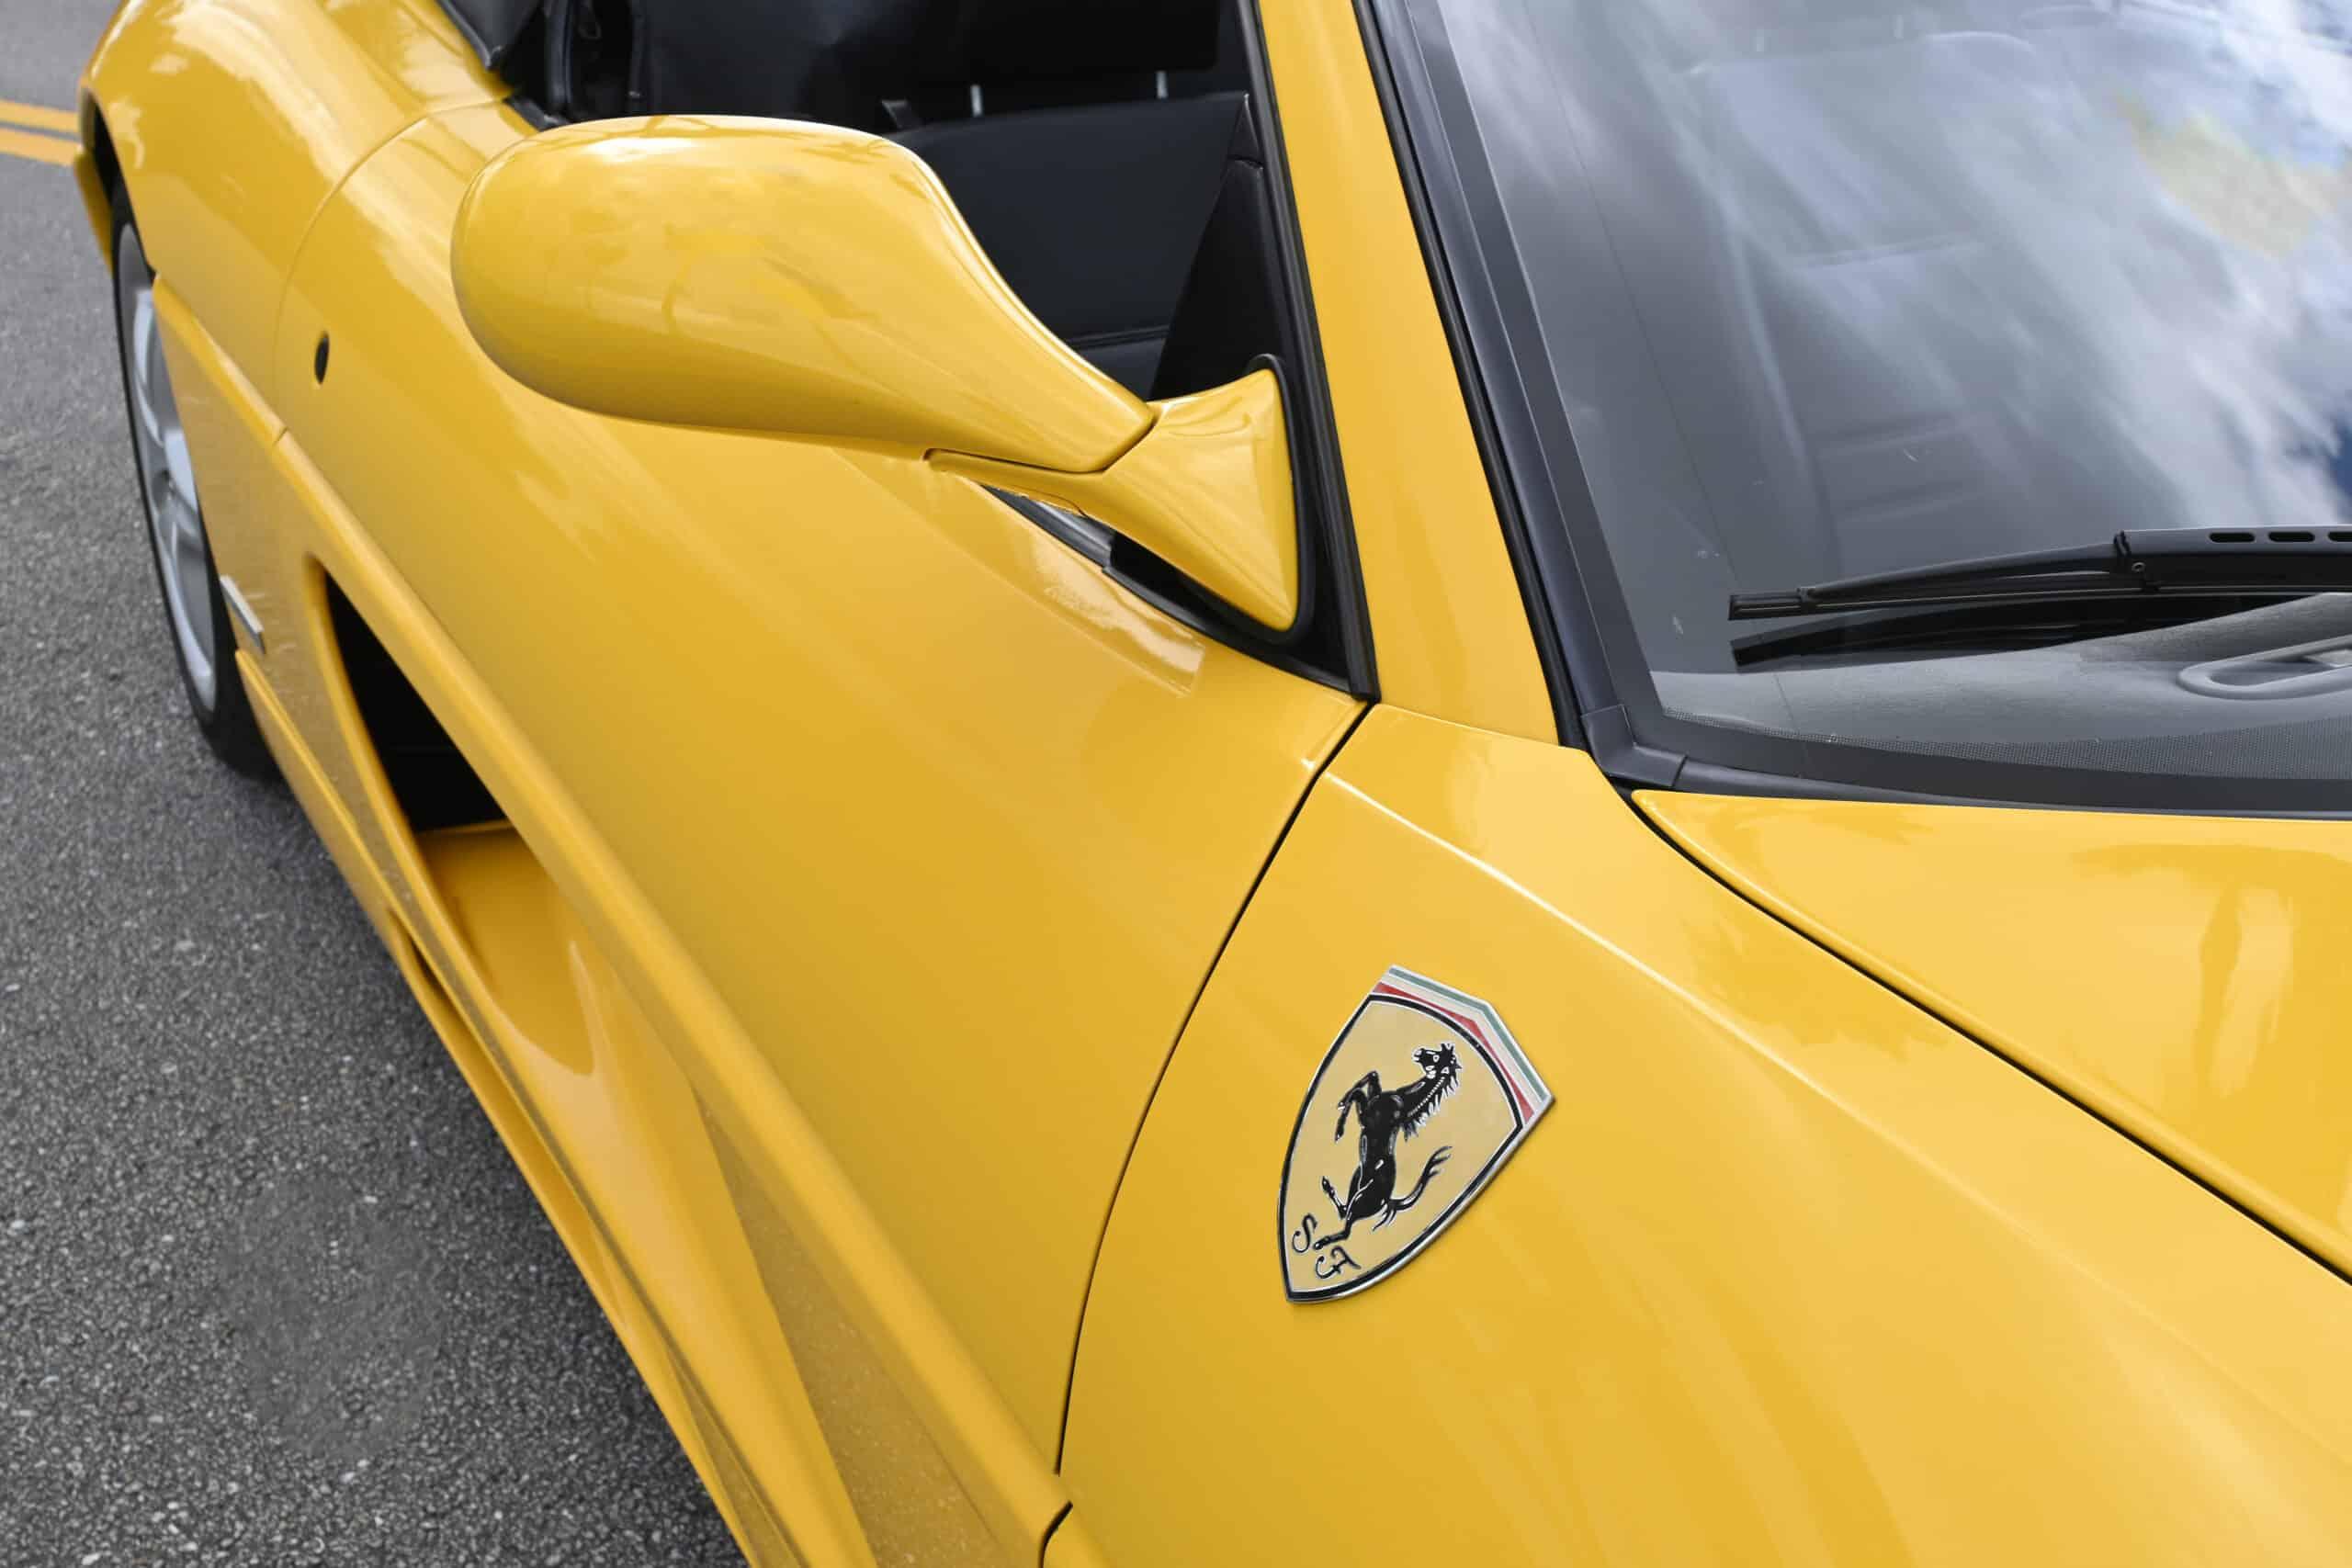 1997 Ferrari F355 Spider, 6-speed gated!, 20K miles records, Challenge Grille, original paint.